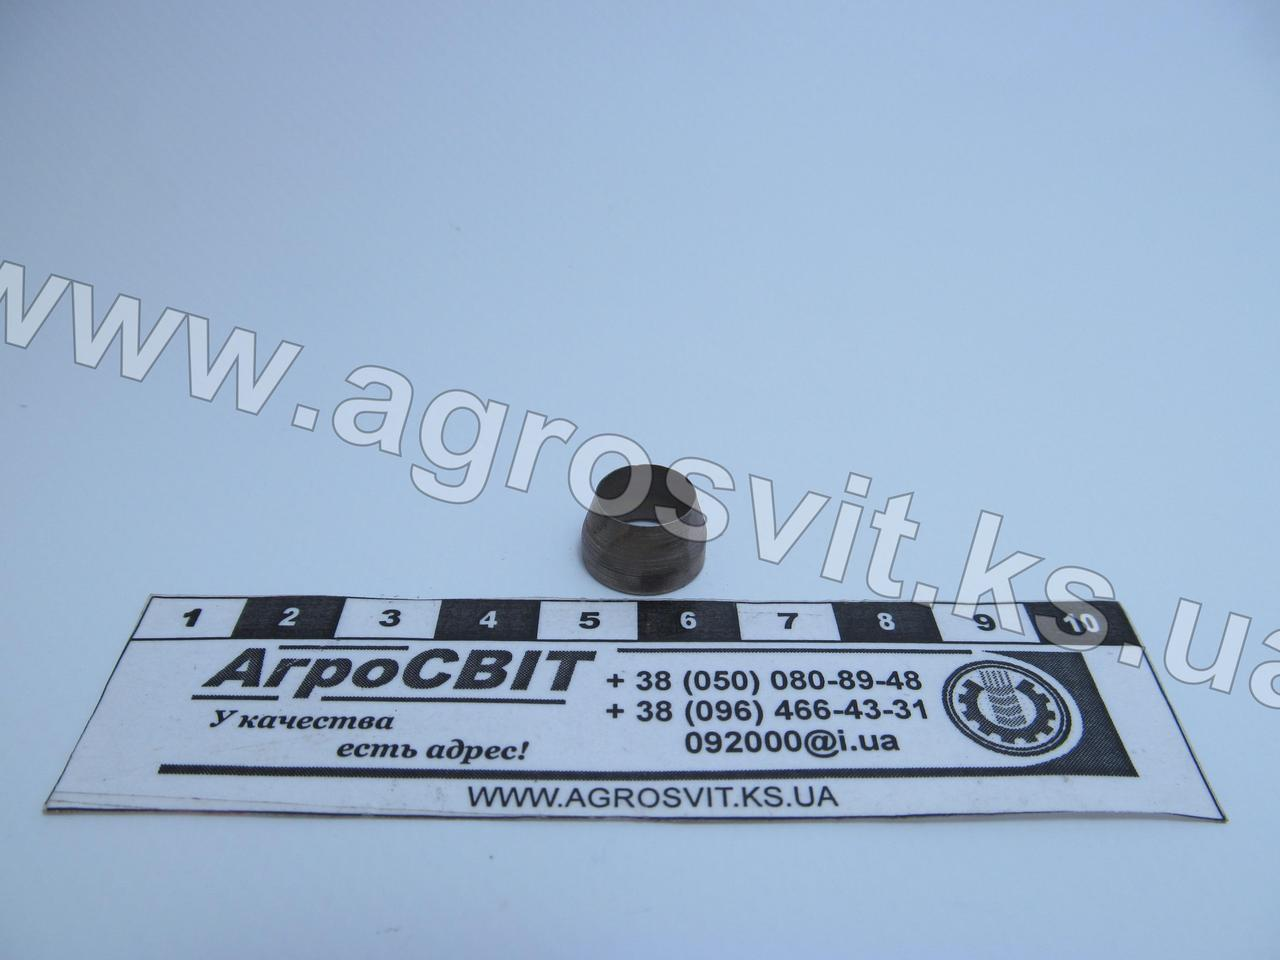 Втулка тормозного трубопровода, диаметр 10 мм.; кат. № 864816